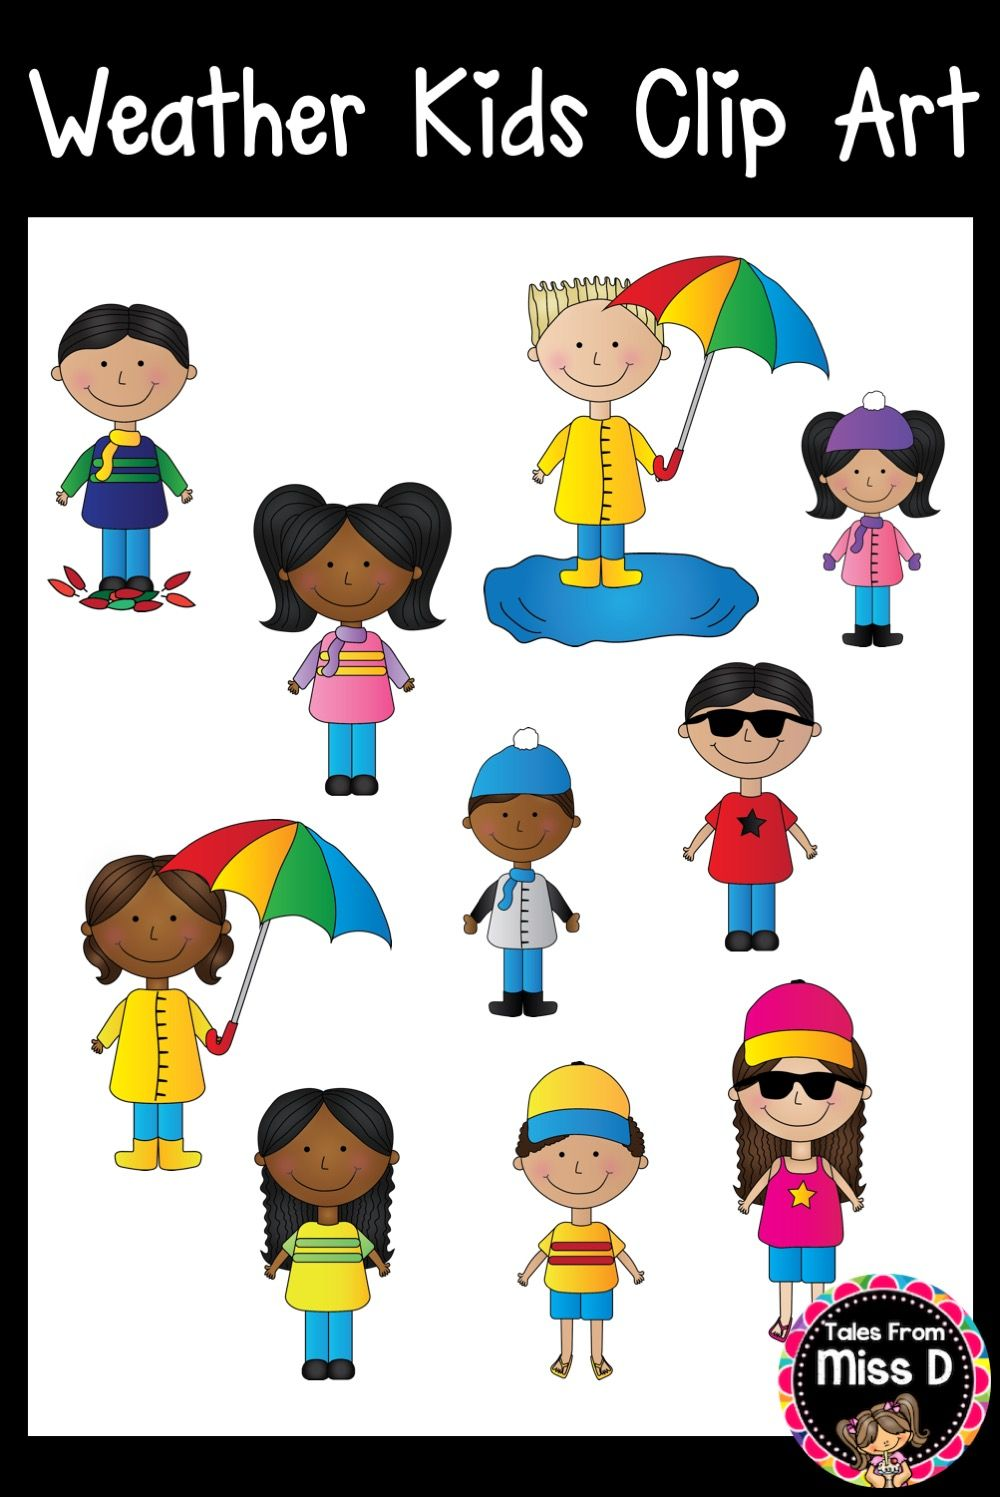 Weather Kids Clip Art | Girl in rain, Clip art, Cool ...